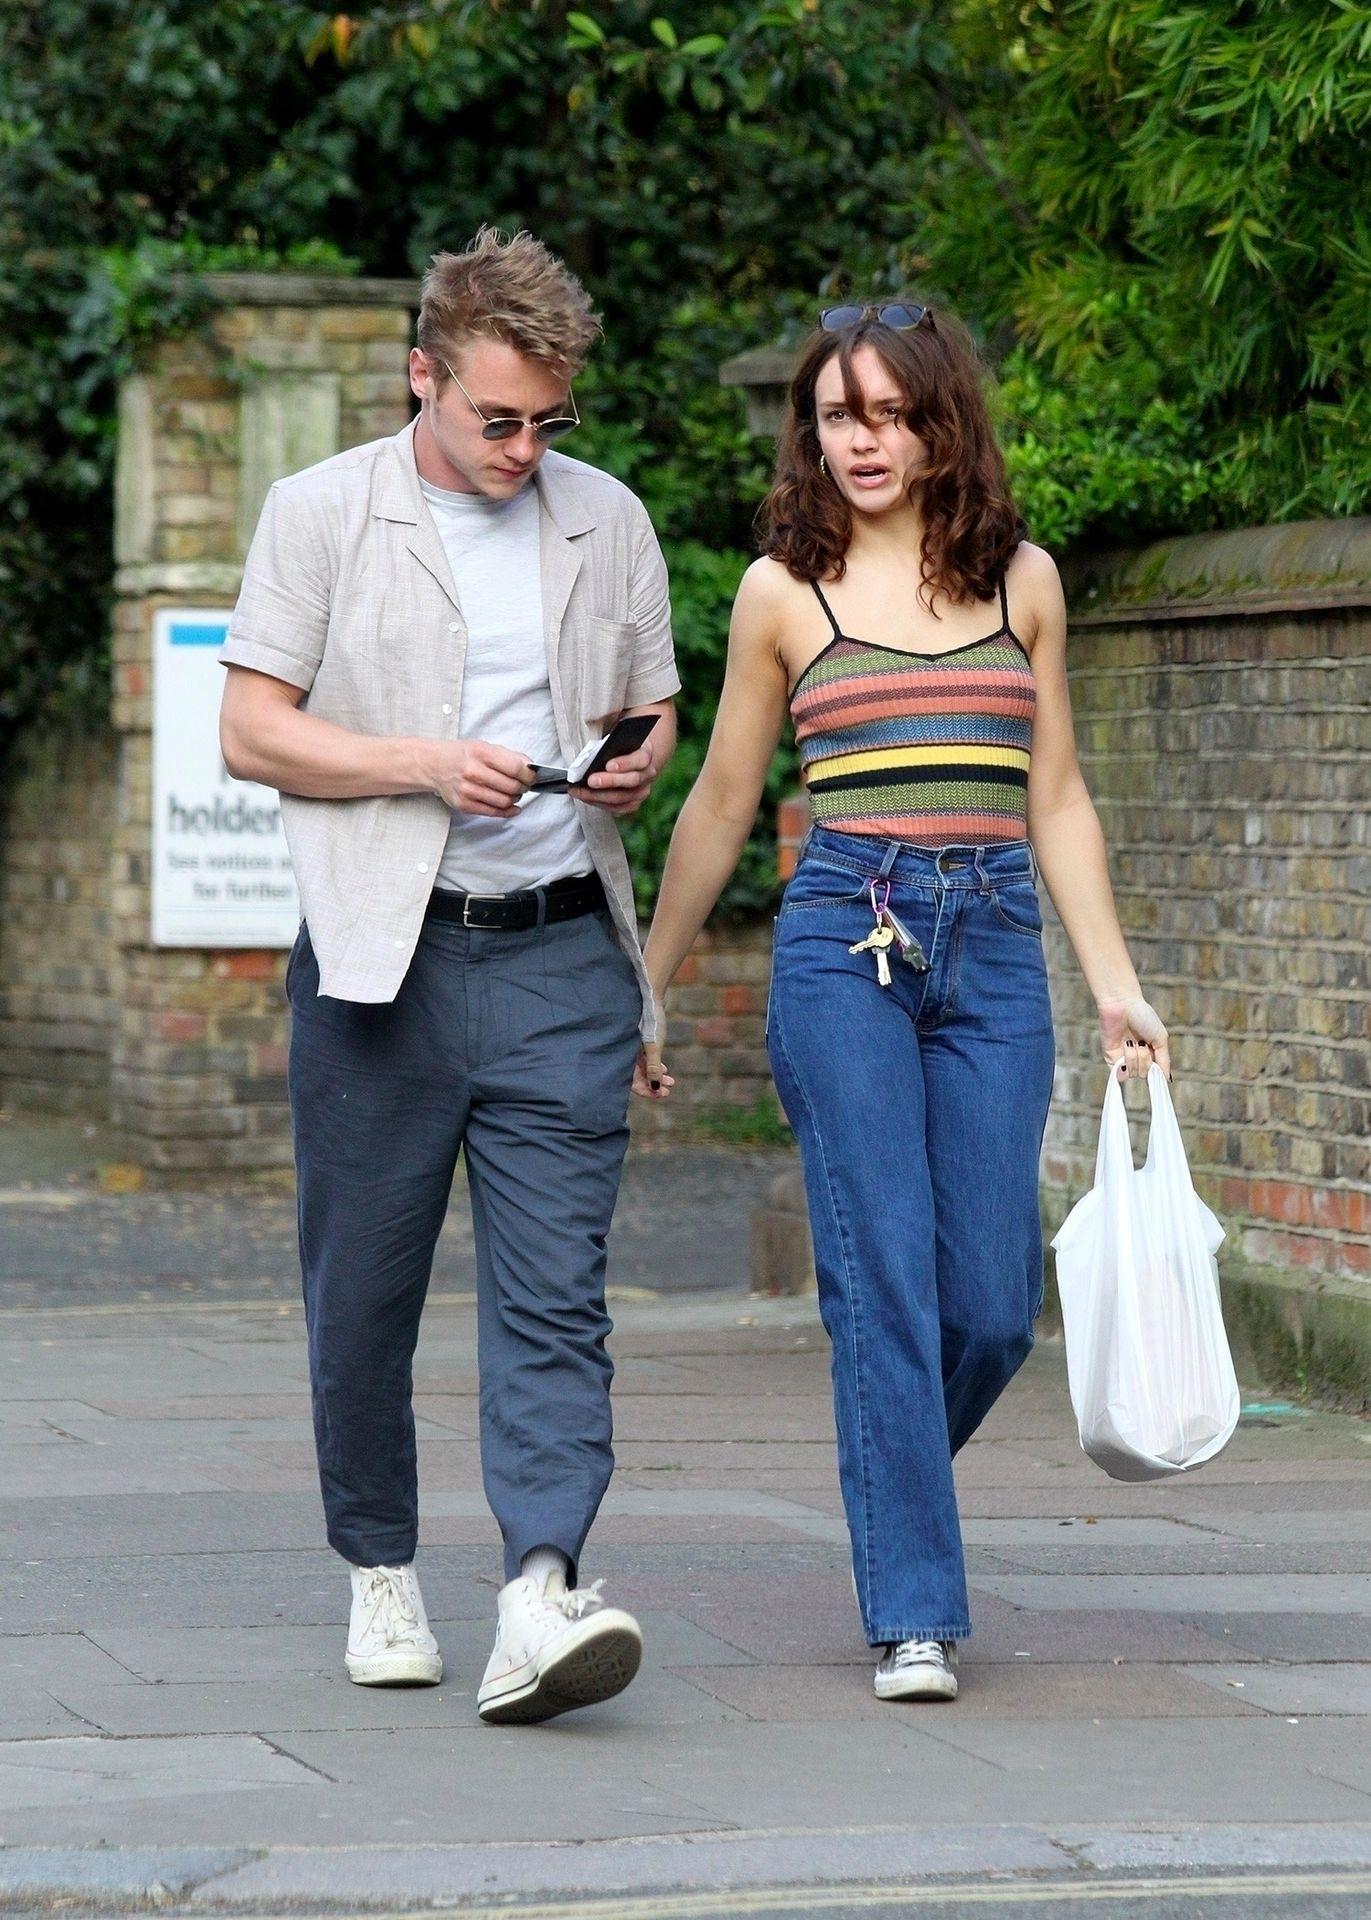 Ben Hardy Walks Hand In Hand With Actress Girlfriend Olivia Cooke 0006